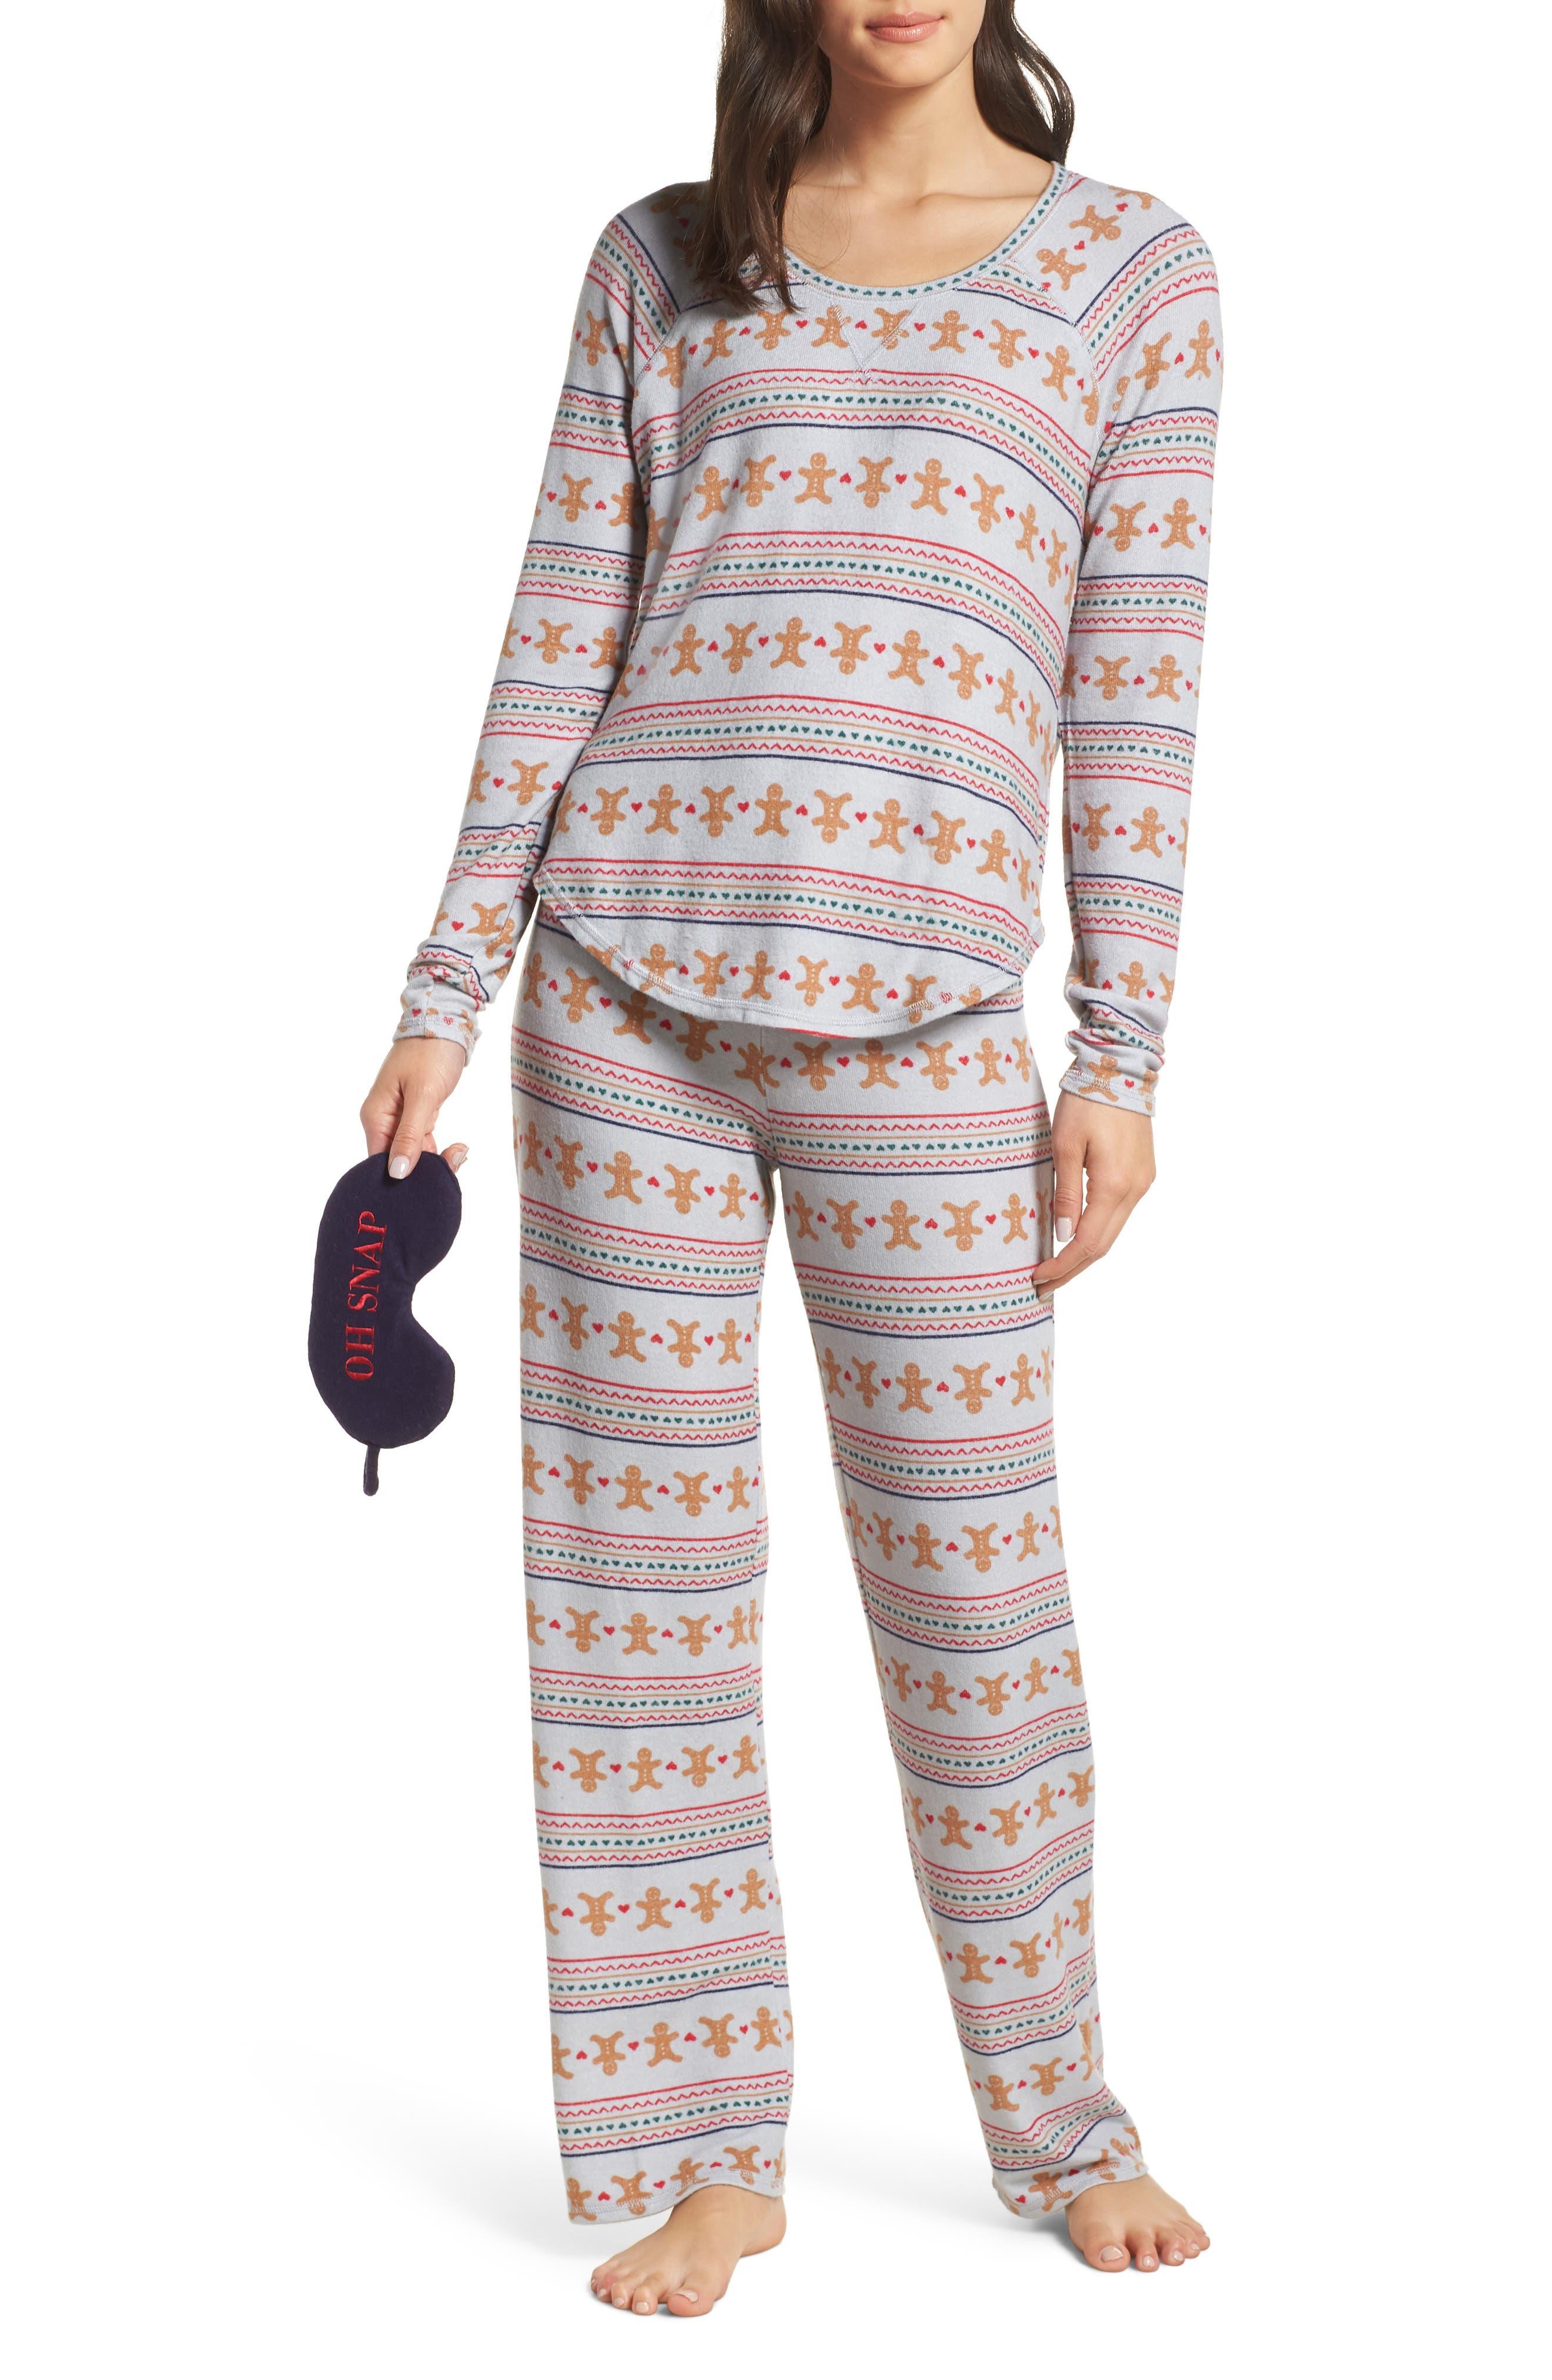 Knit Girlfriend Pajamas & Eye Mask,                         Main,                         color, GREY MICRO GINGERBREAD